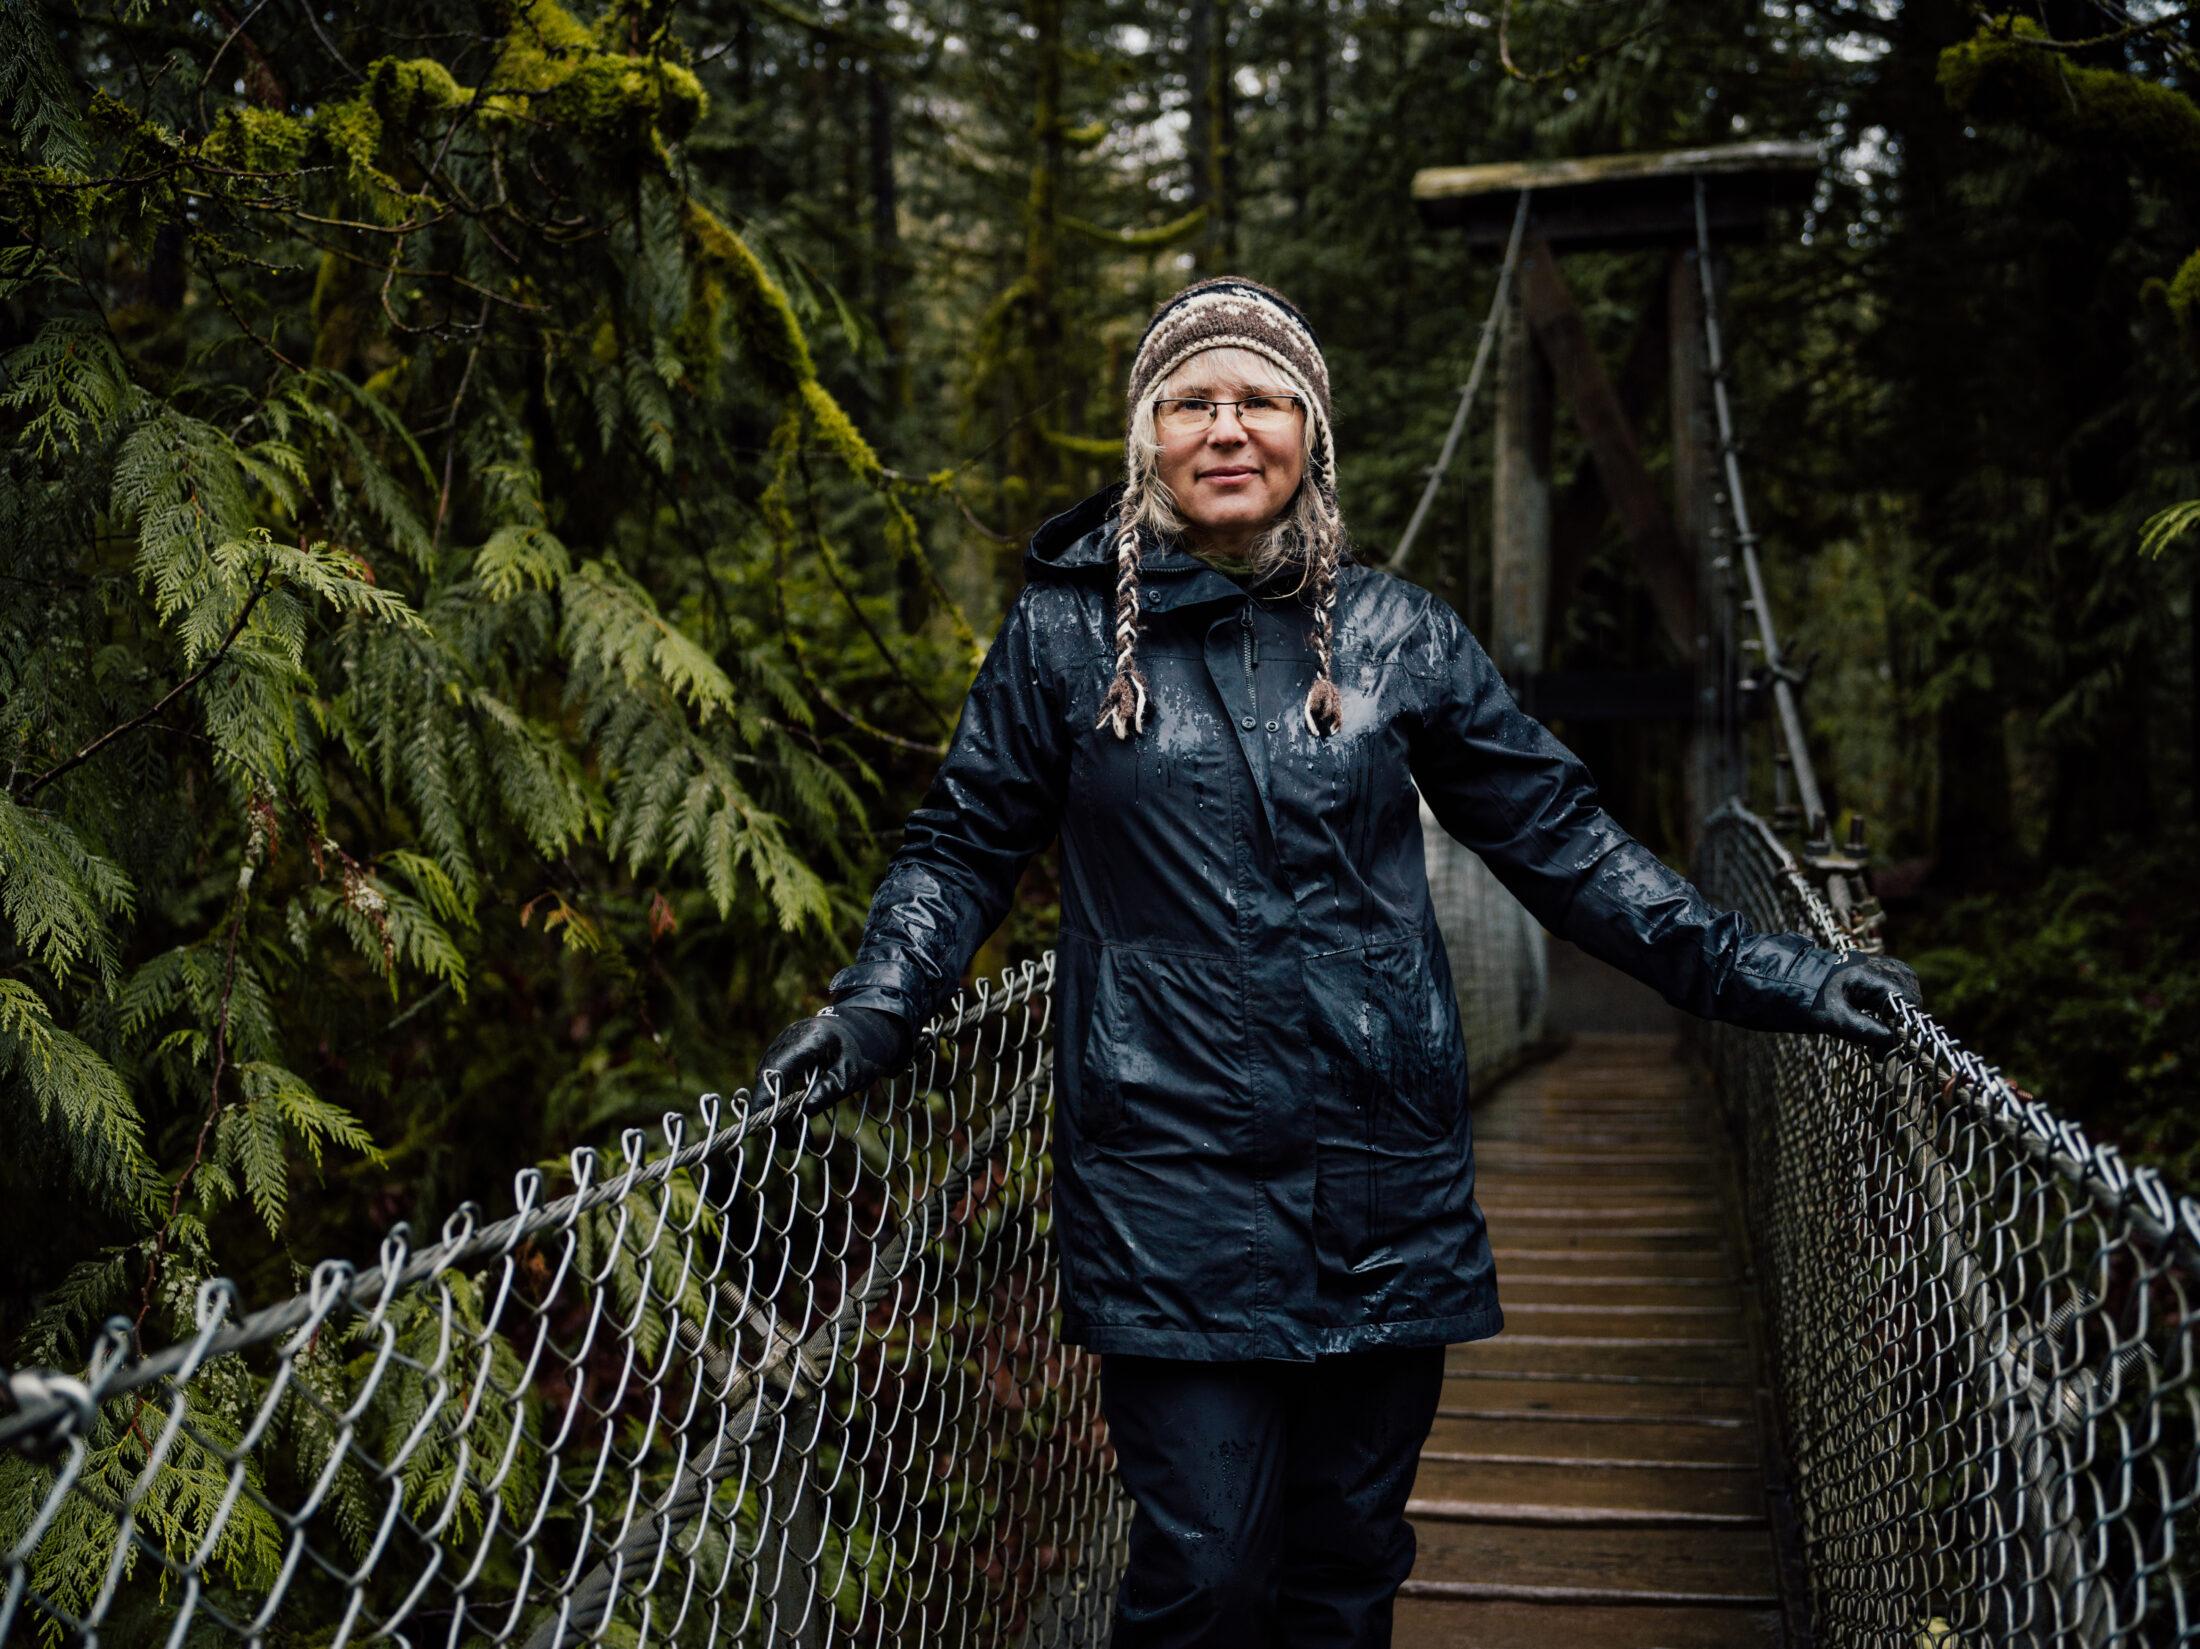 Cheri Ayers stands on a suspension bridge